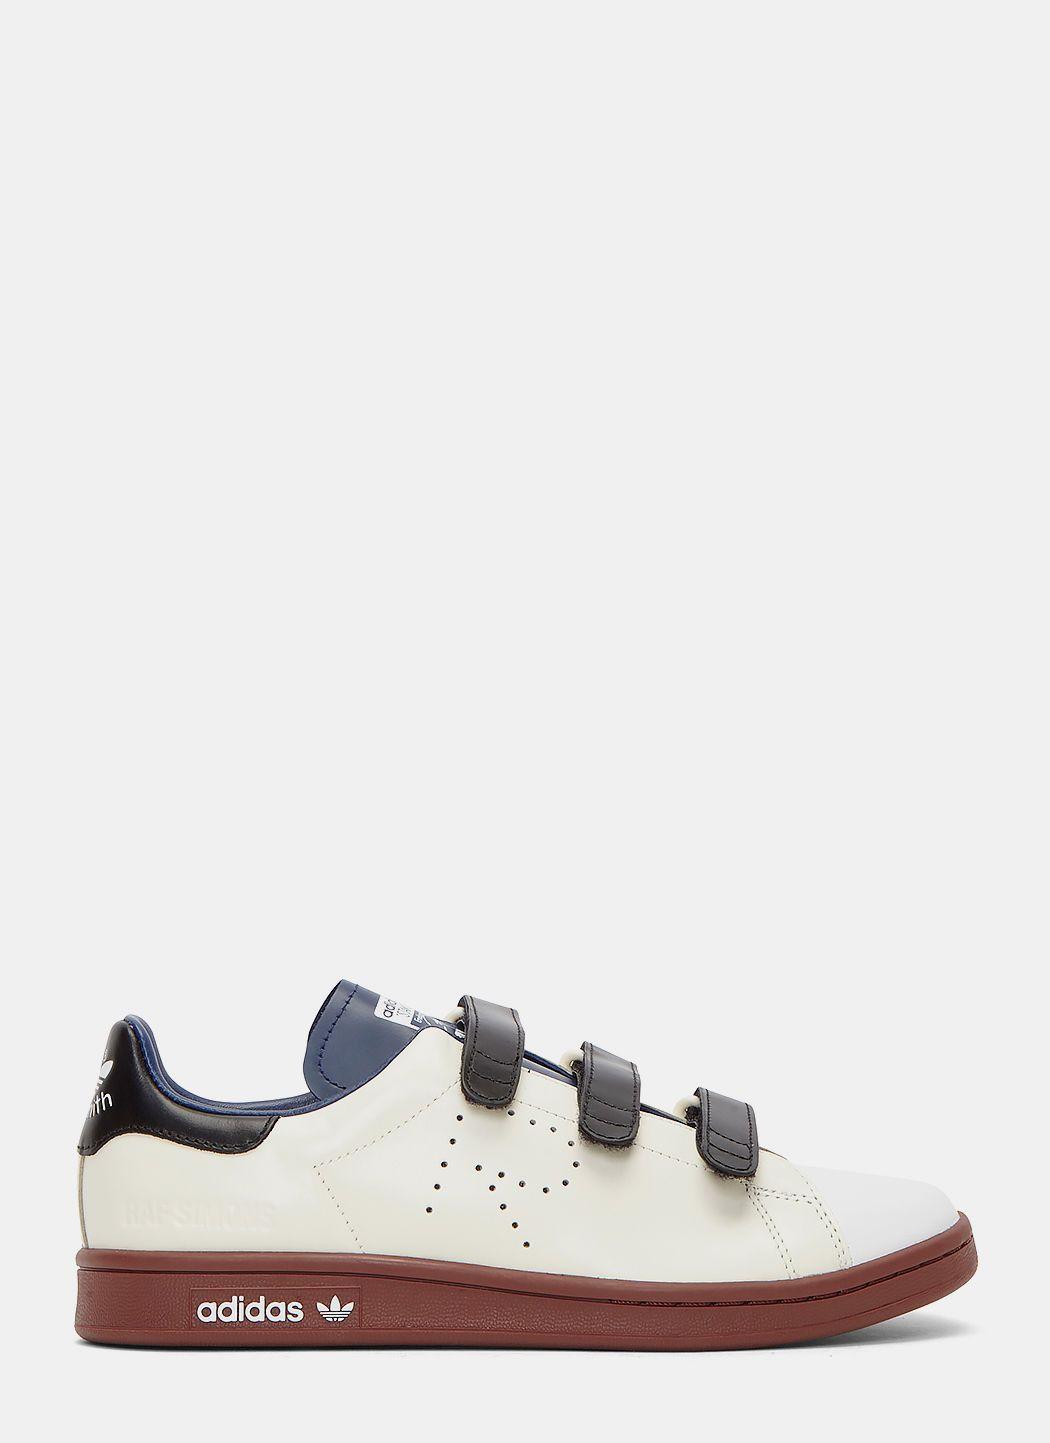 Raf Simons Unisex Velcro Strapped Stan Smith Comfort Sneakers In Cream In Cream White Dark Blue Fox Brown Modesens Comfortable Sneakers Sneakers Velcro Straps